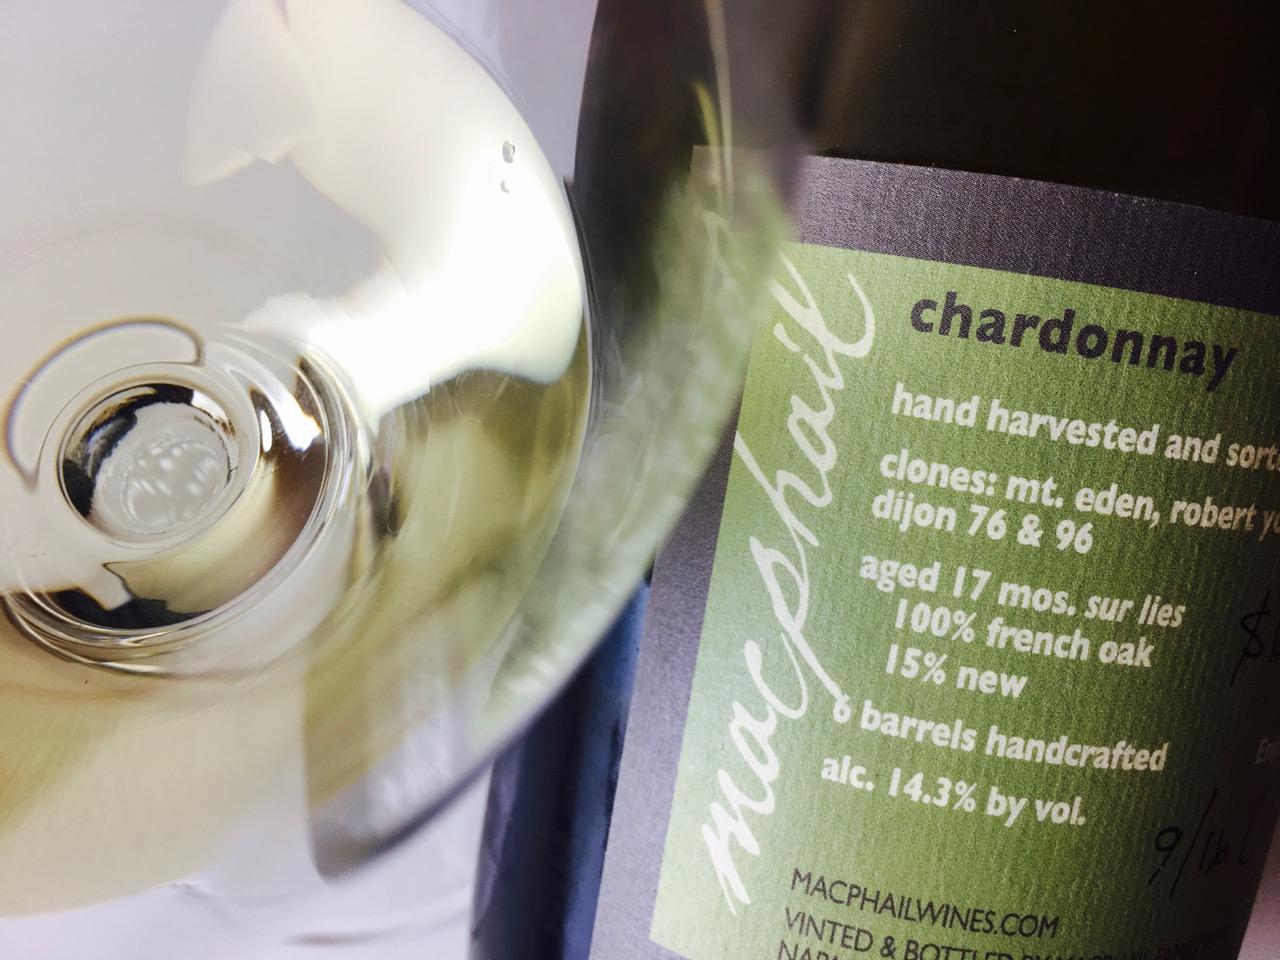 2014 Macphail Family Wines Chardonnay Vagon Blanc Sonoma Coast